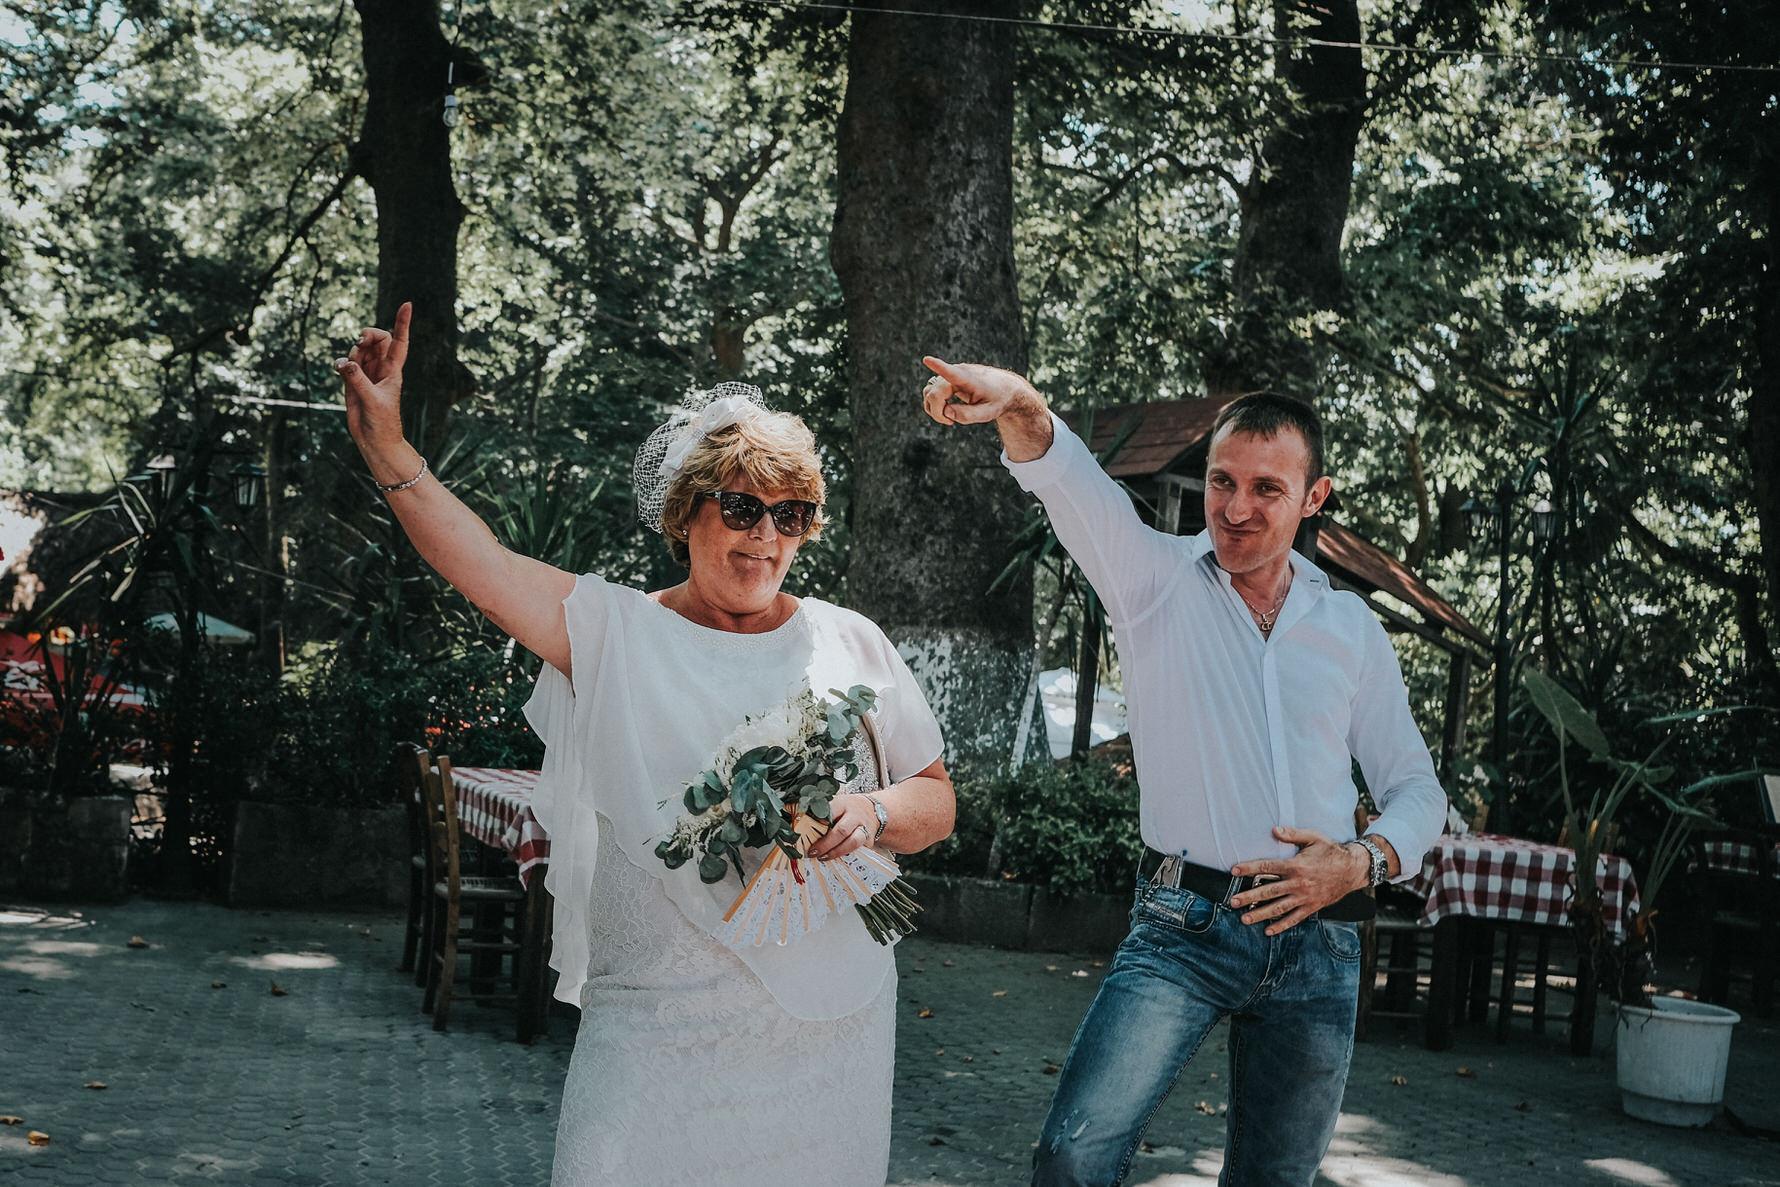 Cheshire Documentary Wedding Photography in Crete